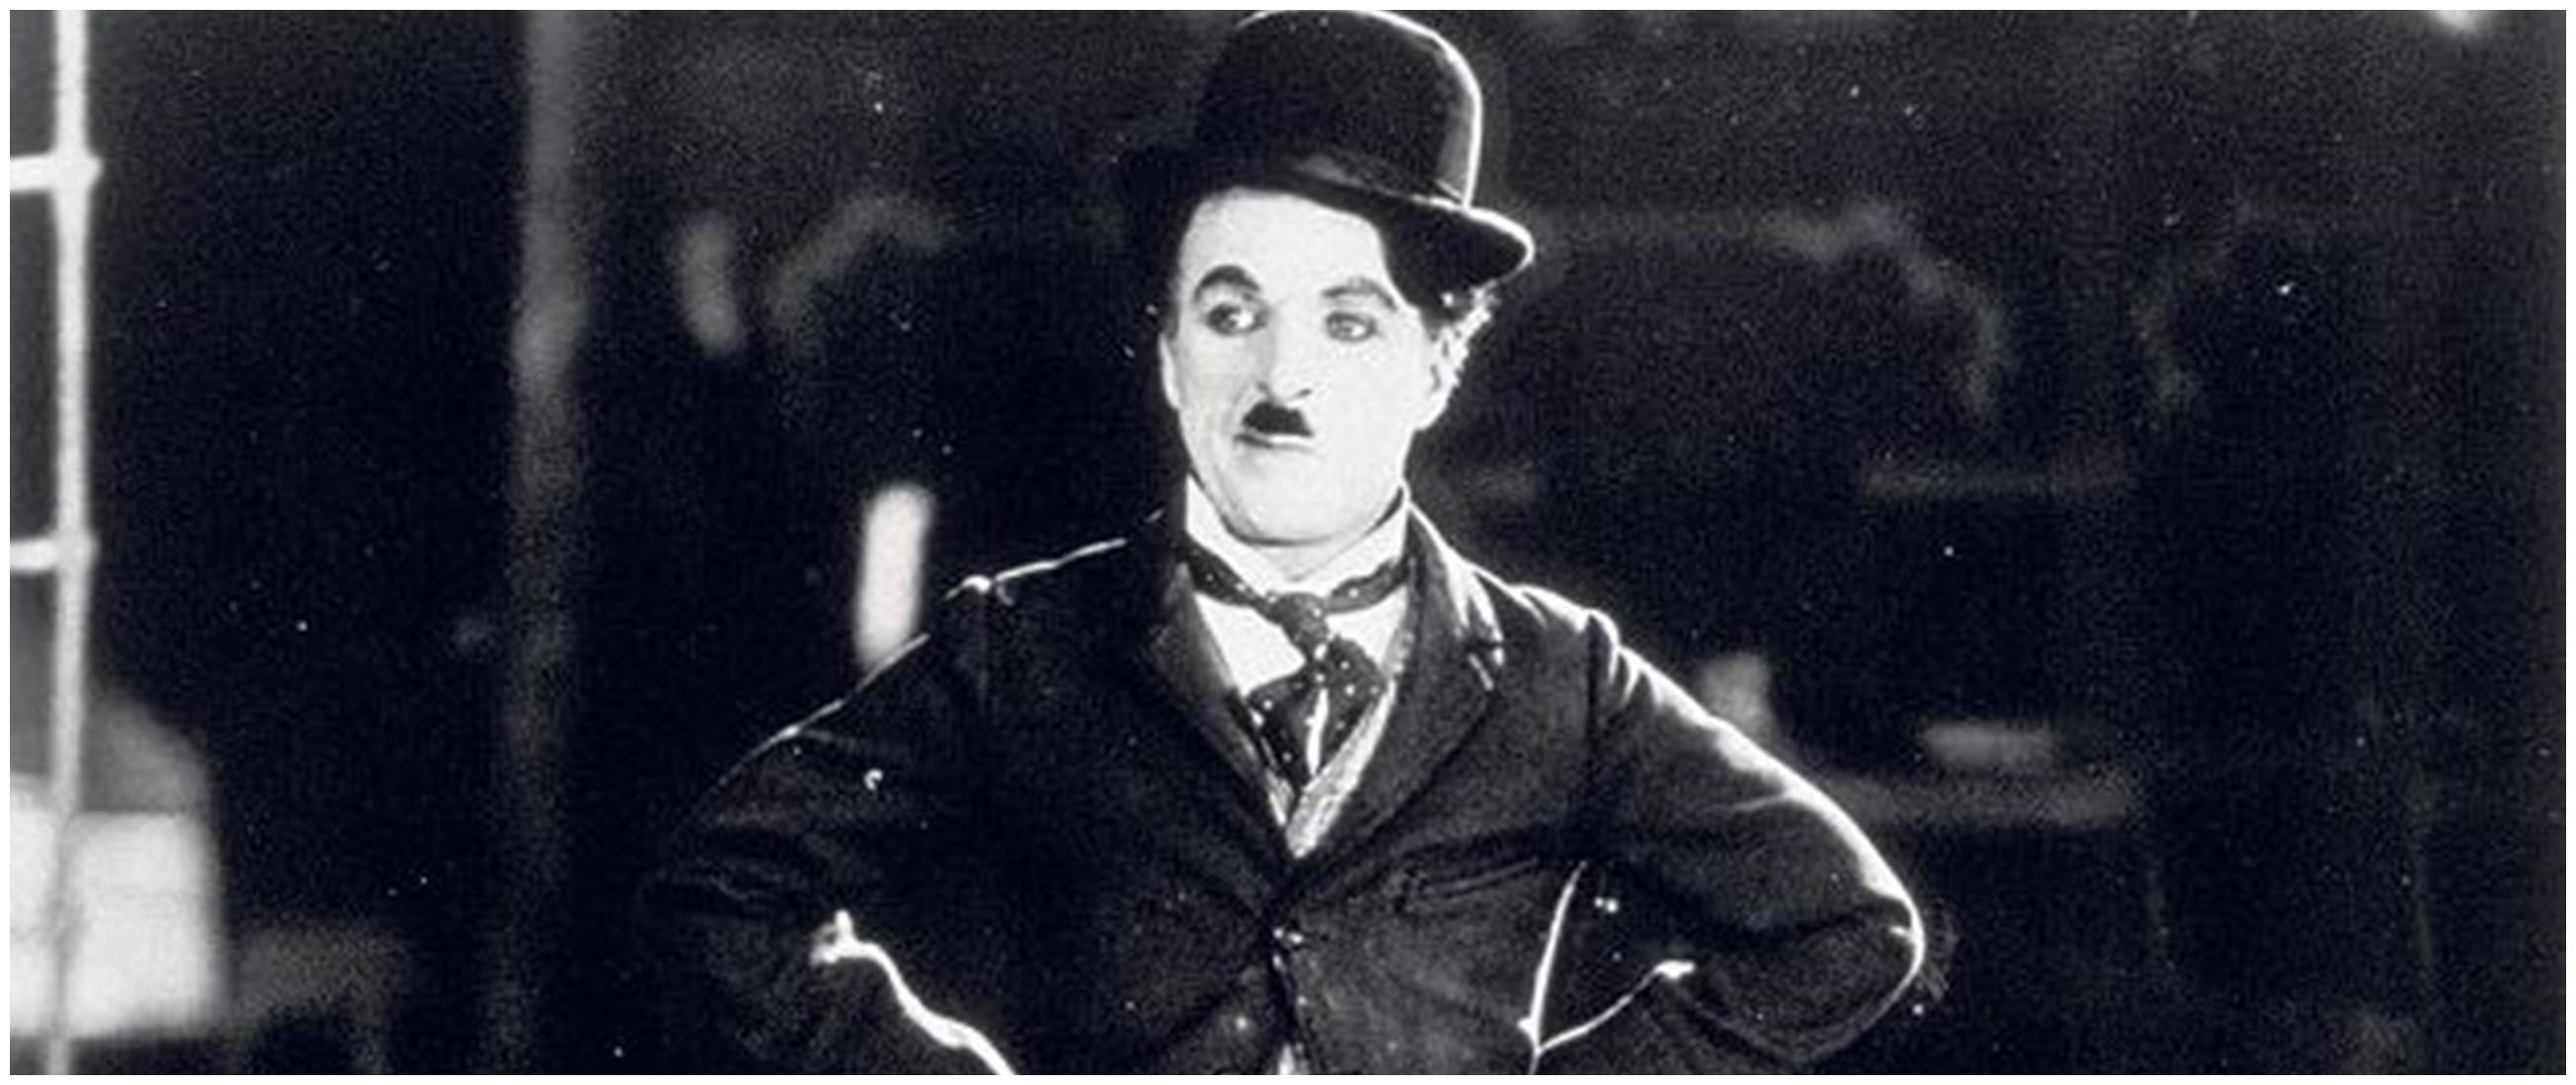 33 Kata-kata quote Charlie Chaplin, bikin hidup lebih positif